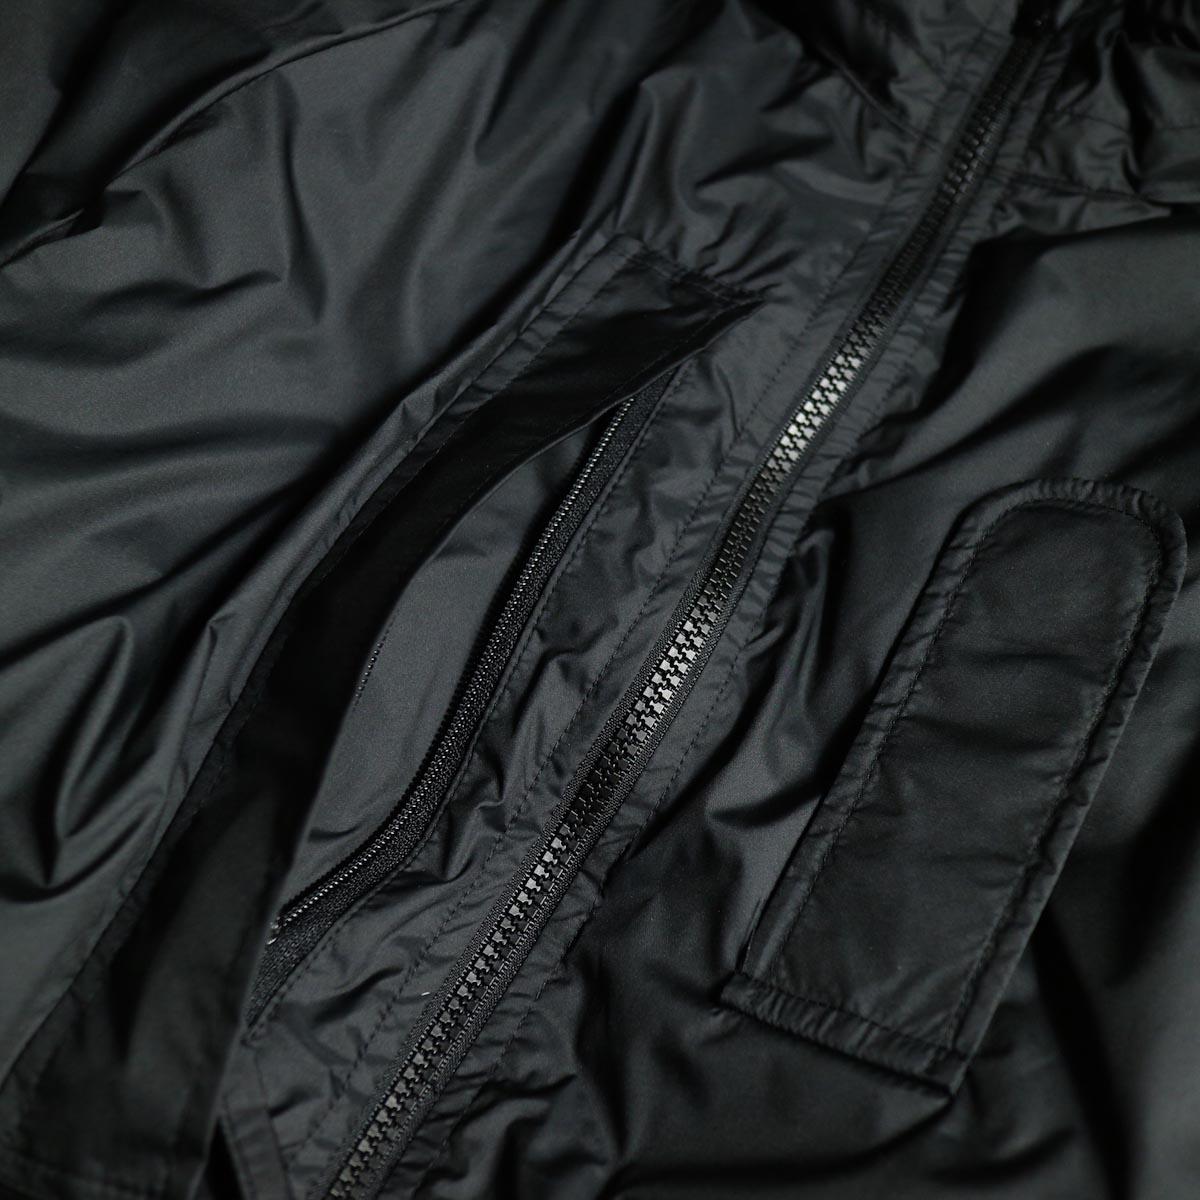 J&S Franklin / BRITISH ARMY PCS LIGHT WEIGHT DOWN JACKET (Black) ポケット